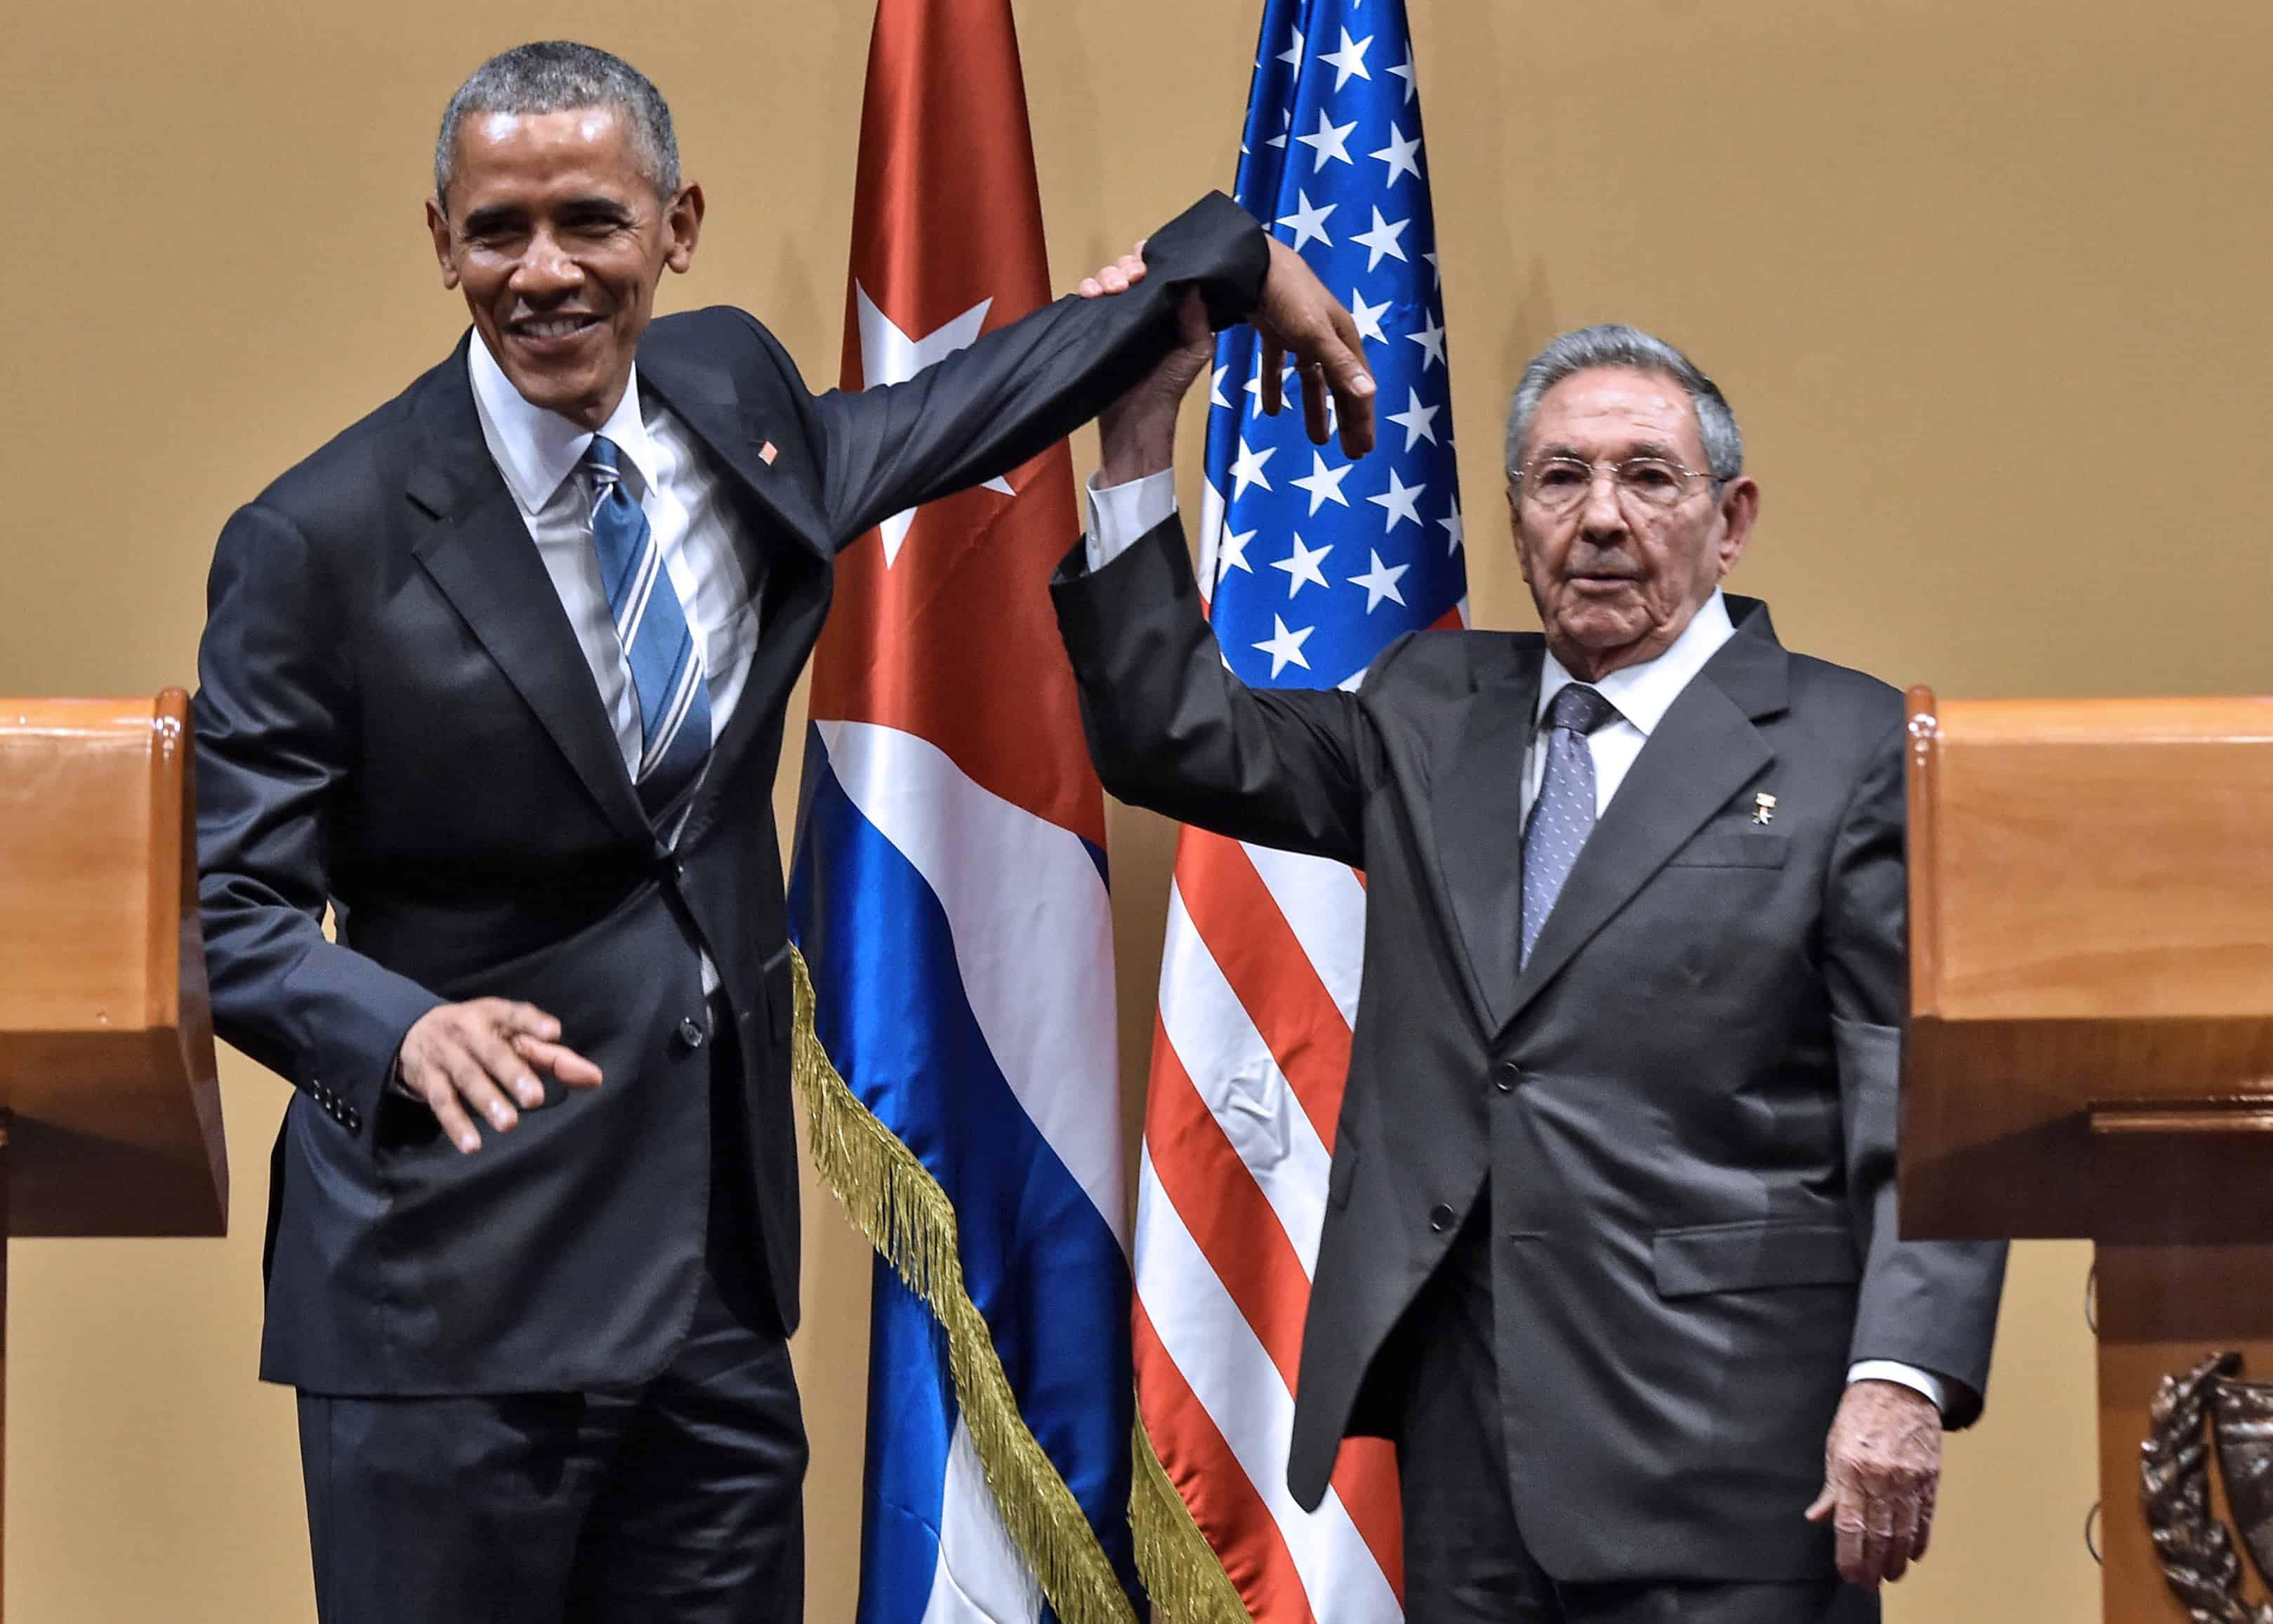 Obama in Cuba | President Raúl Castro awkwardly raises President Obama's arm